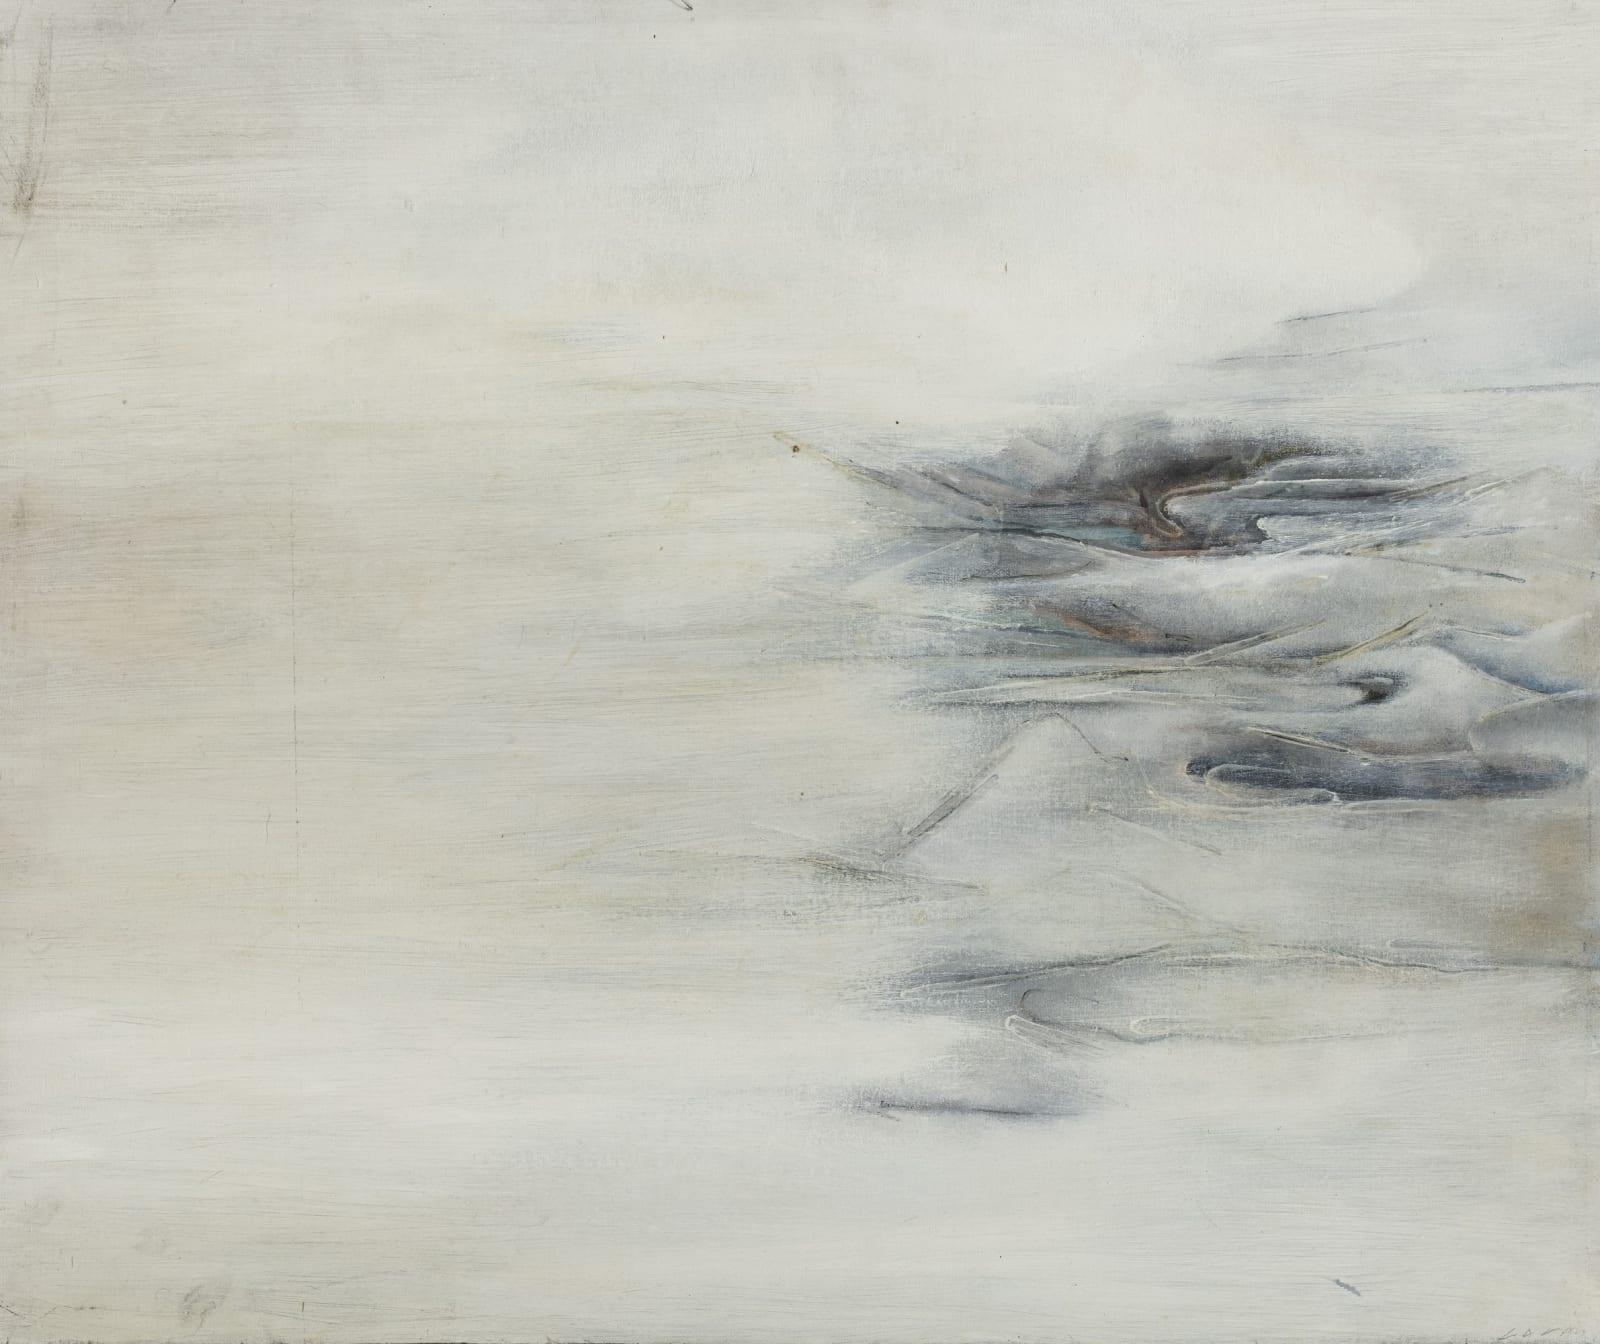 Lalan 謝景蘭, L'eau | Water《水》, 1984